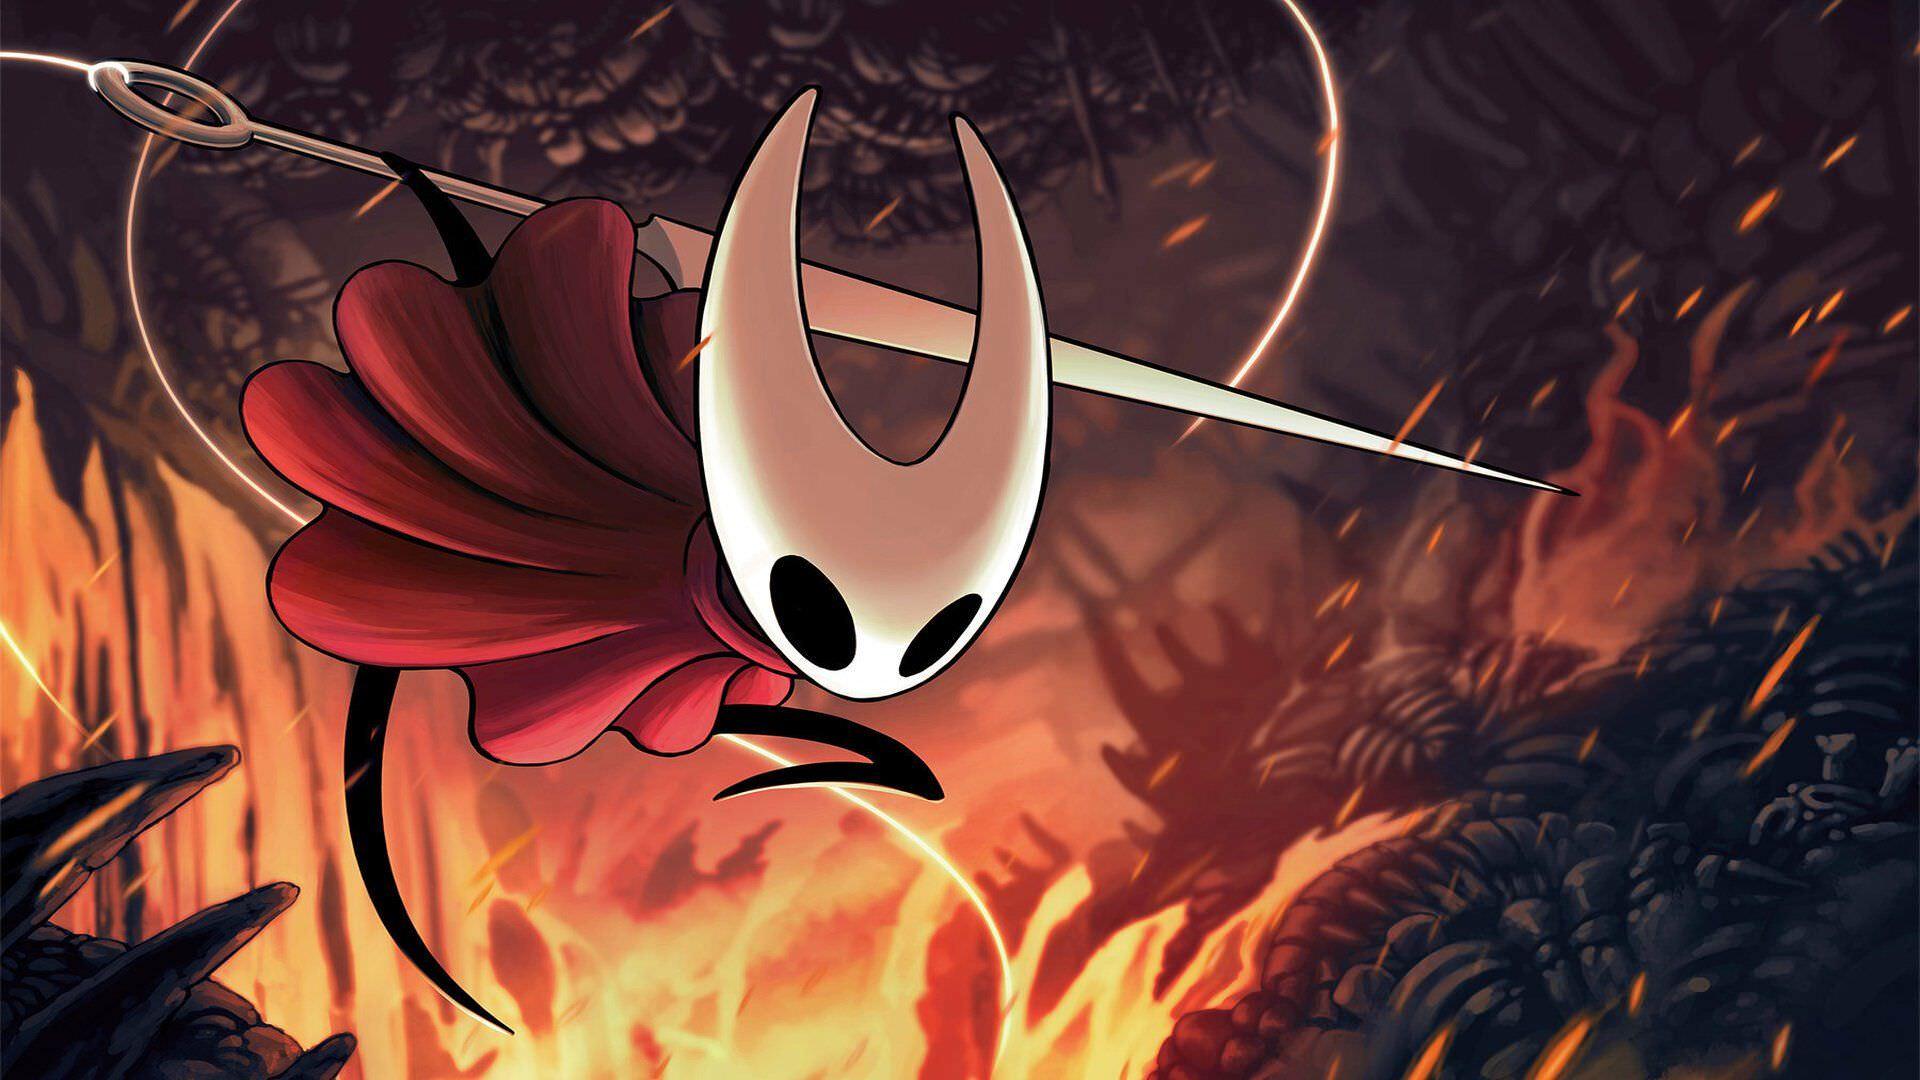 Team Cherry поделилась планами после релиза Hollow Knight: Silksong 2